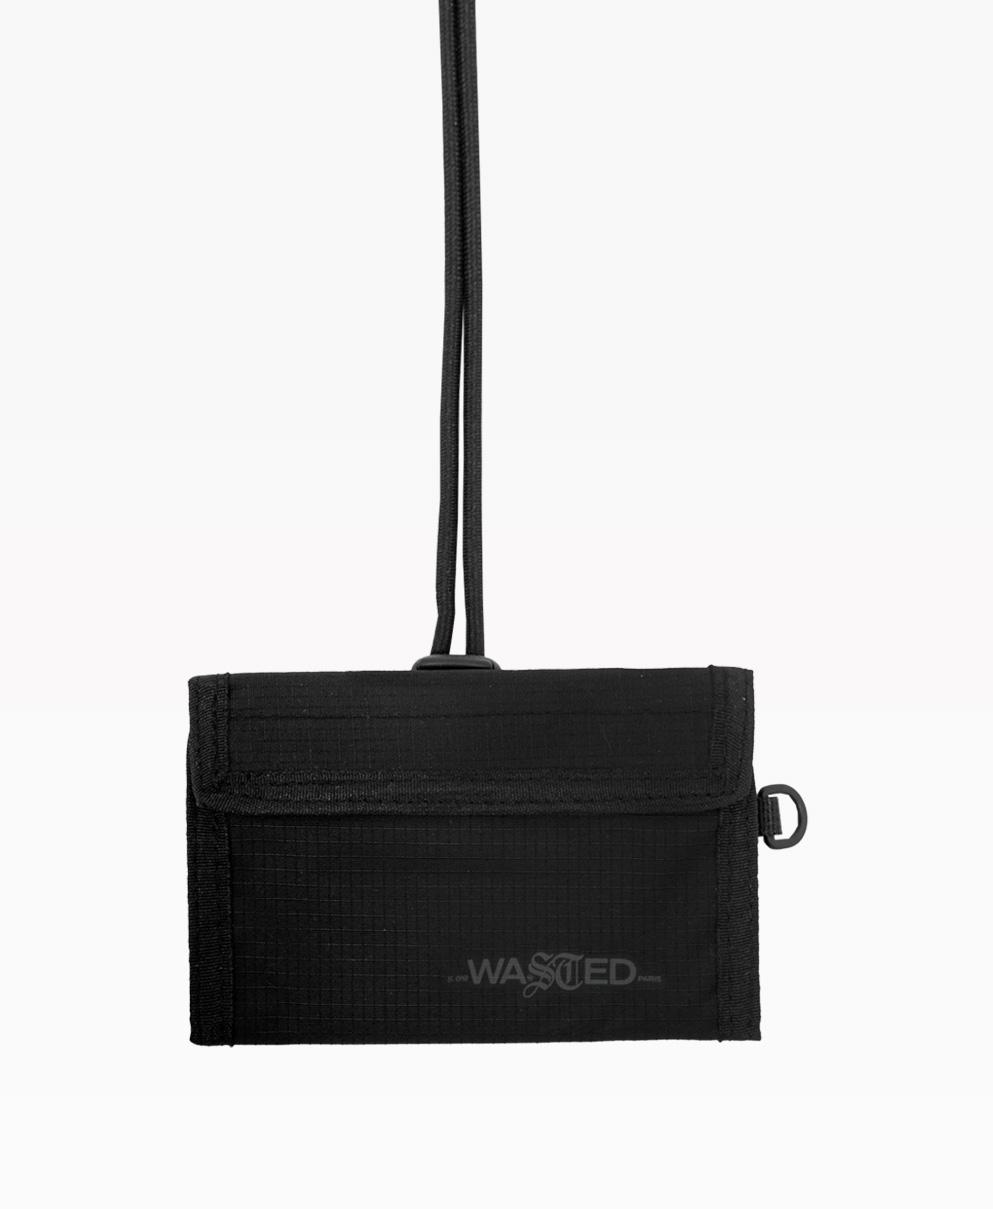 Wasted Summer Wallet Black Front